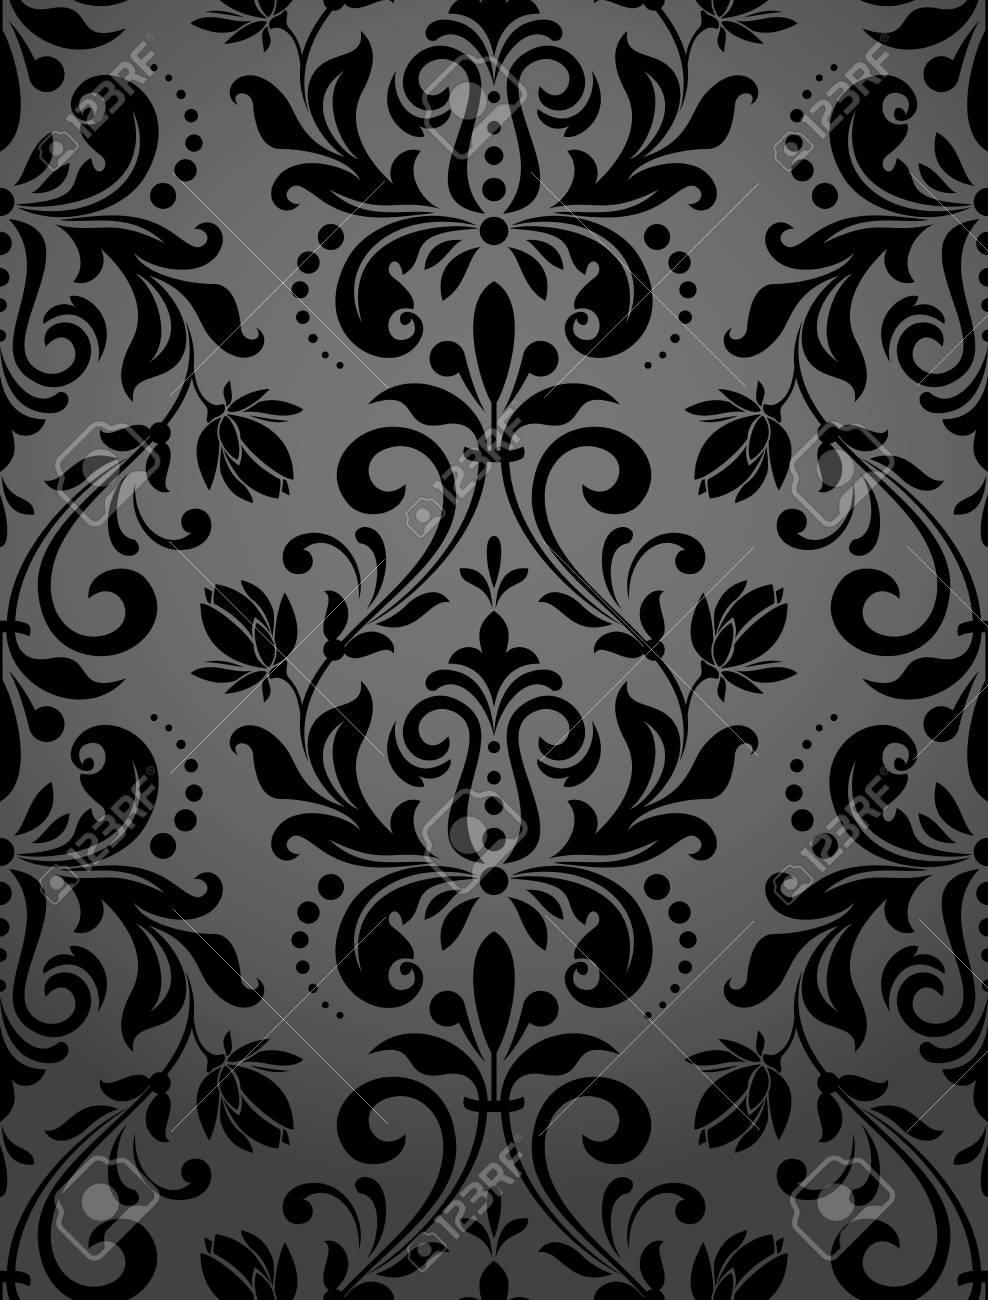 Floral pattern. Wallpaper baroque, damask. Seamless vector background. Black ornament - 97574792